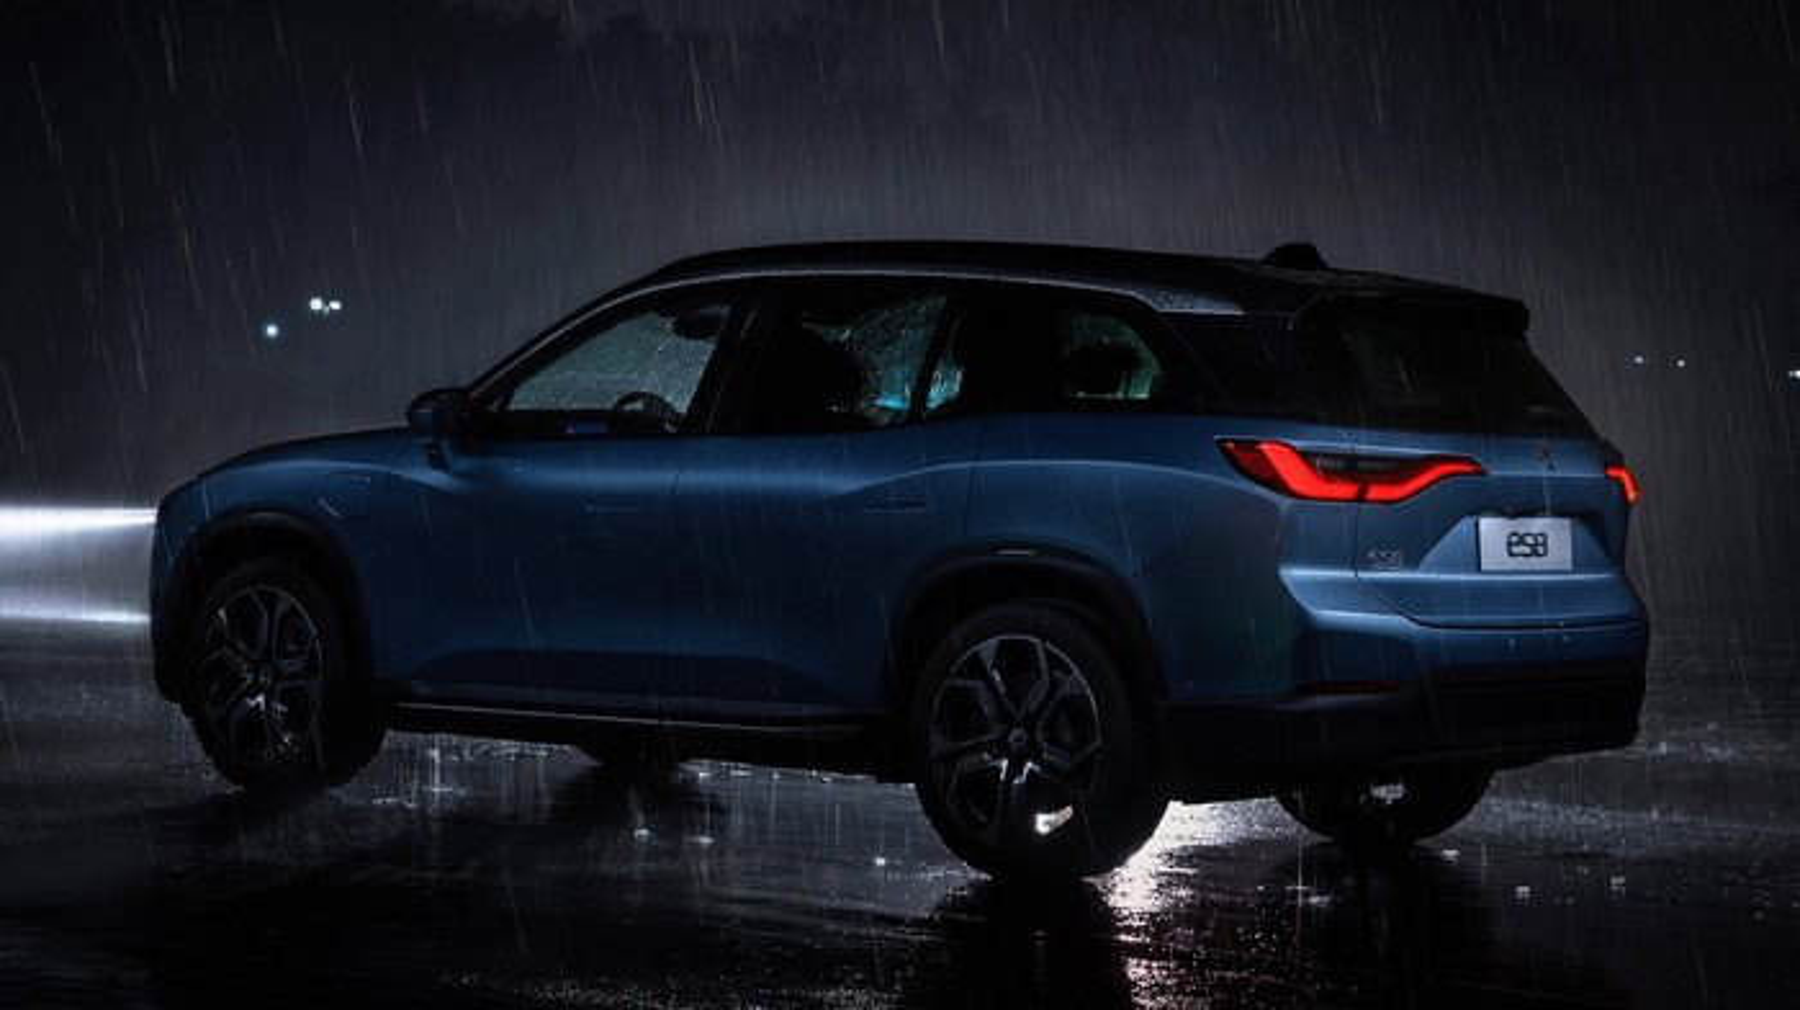 A blue NIO ES8 shown driving in heavy rain at night.